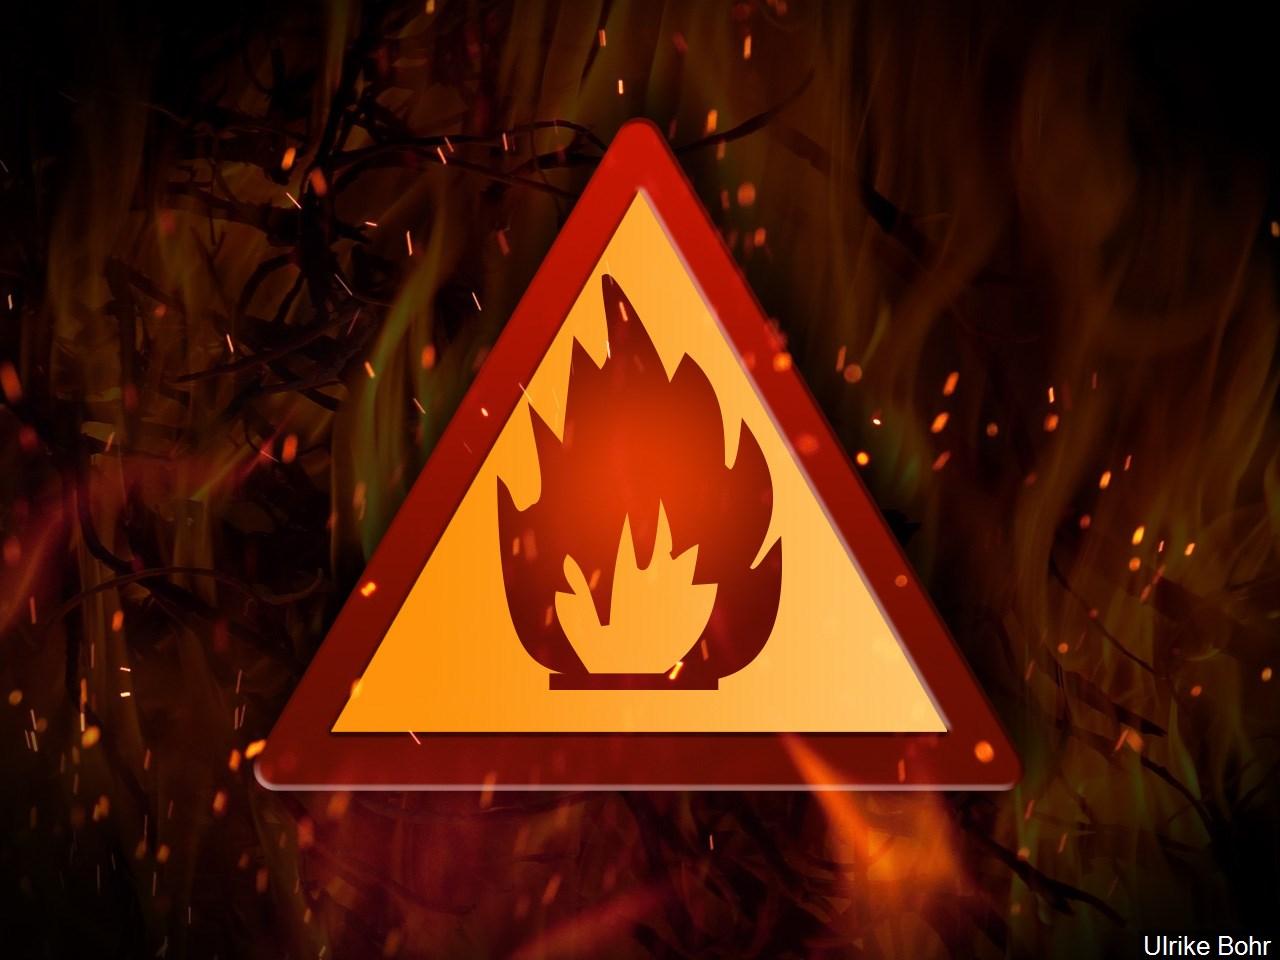 10-23-18 fire safety_1540311105795.jpg.jpg